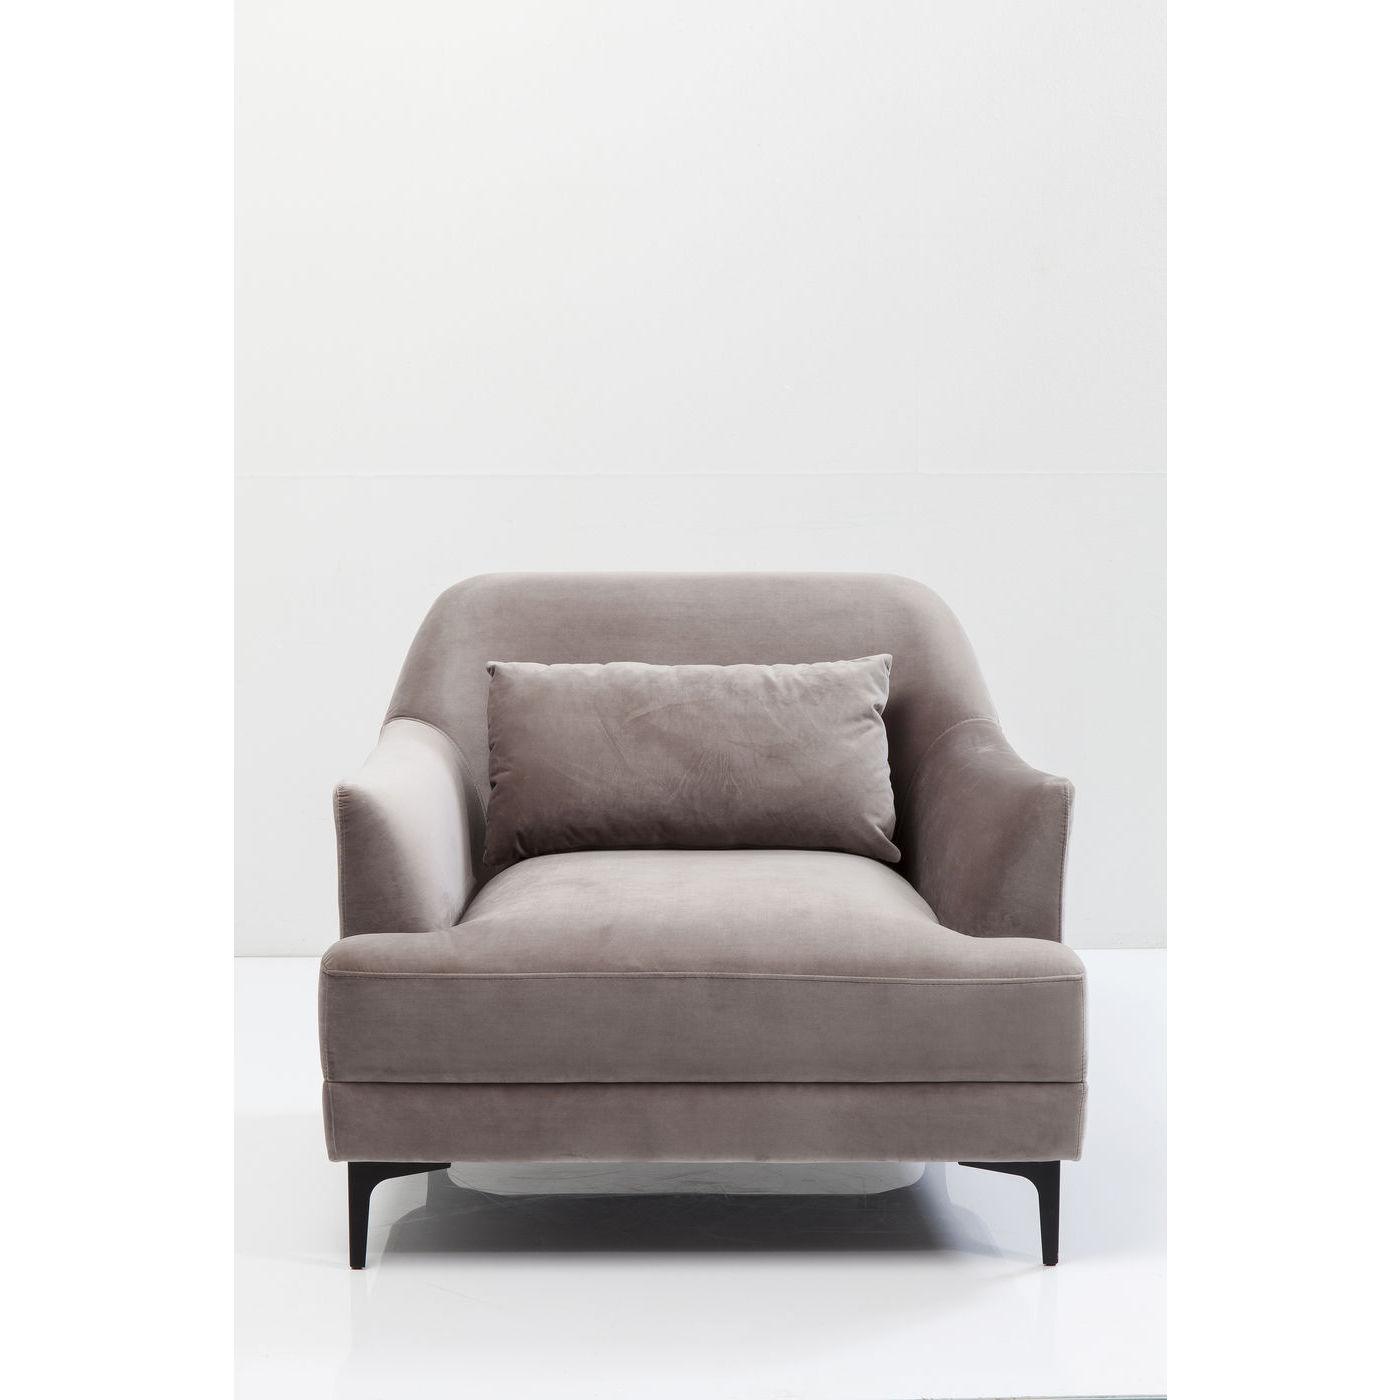 KARE DESIGN Proud Grey lænestol - gråt stof/stål, m. armlæn